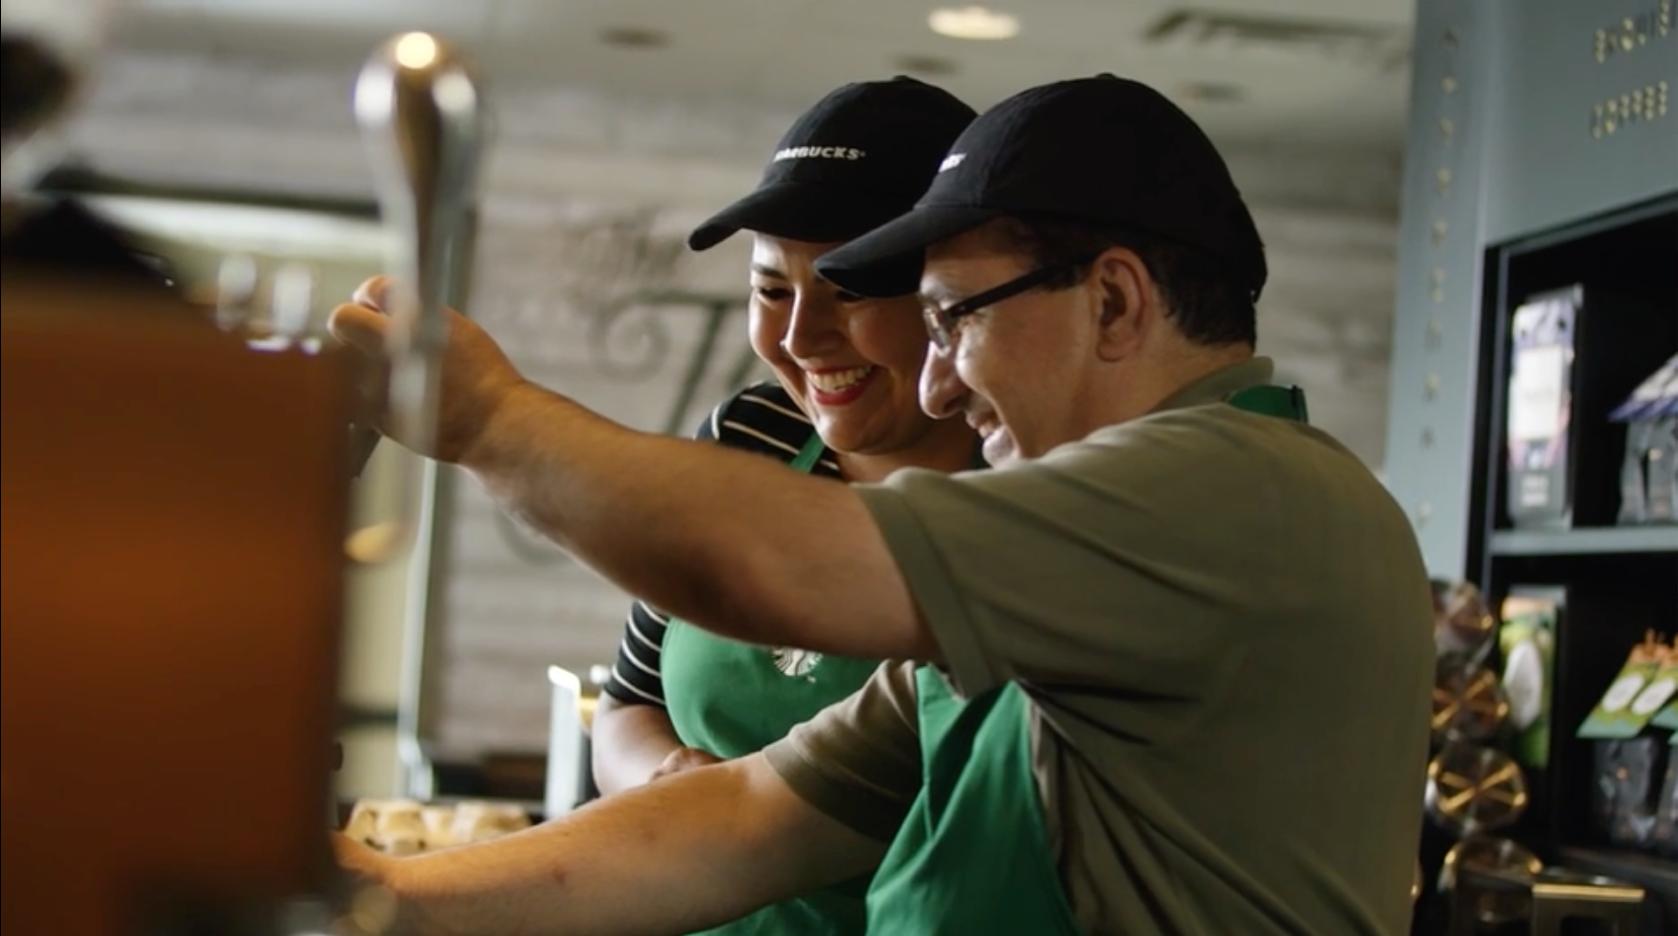 Starbucks employees making espresso.